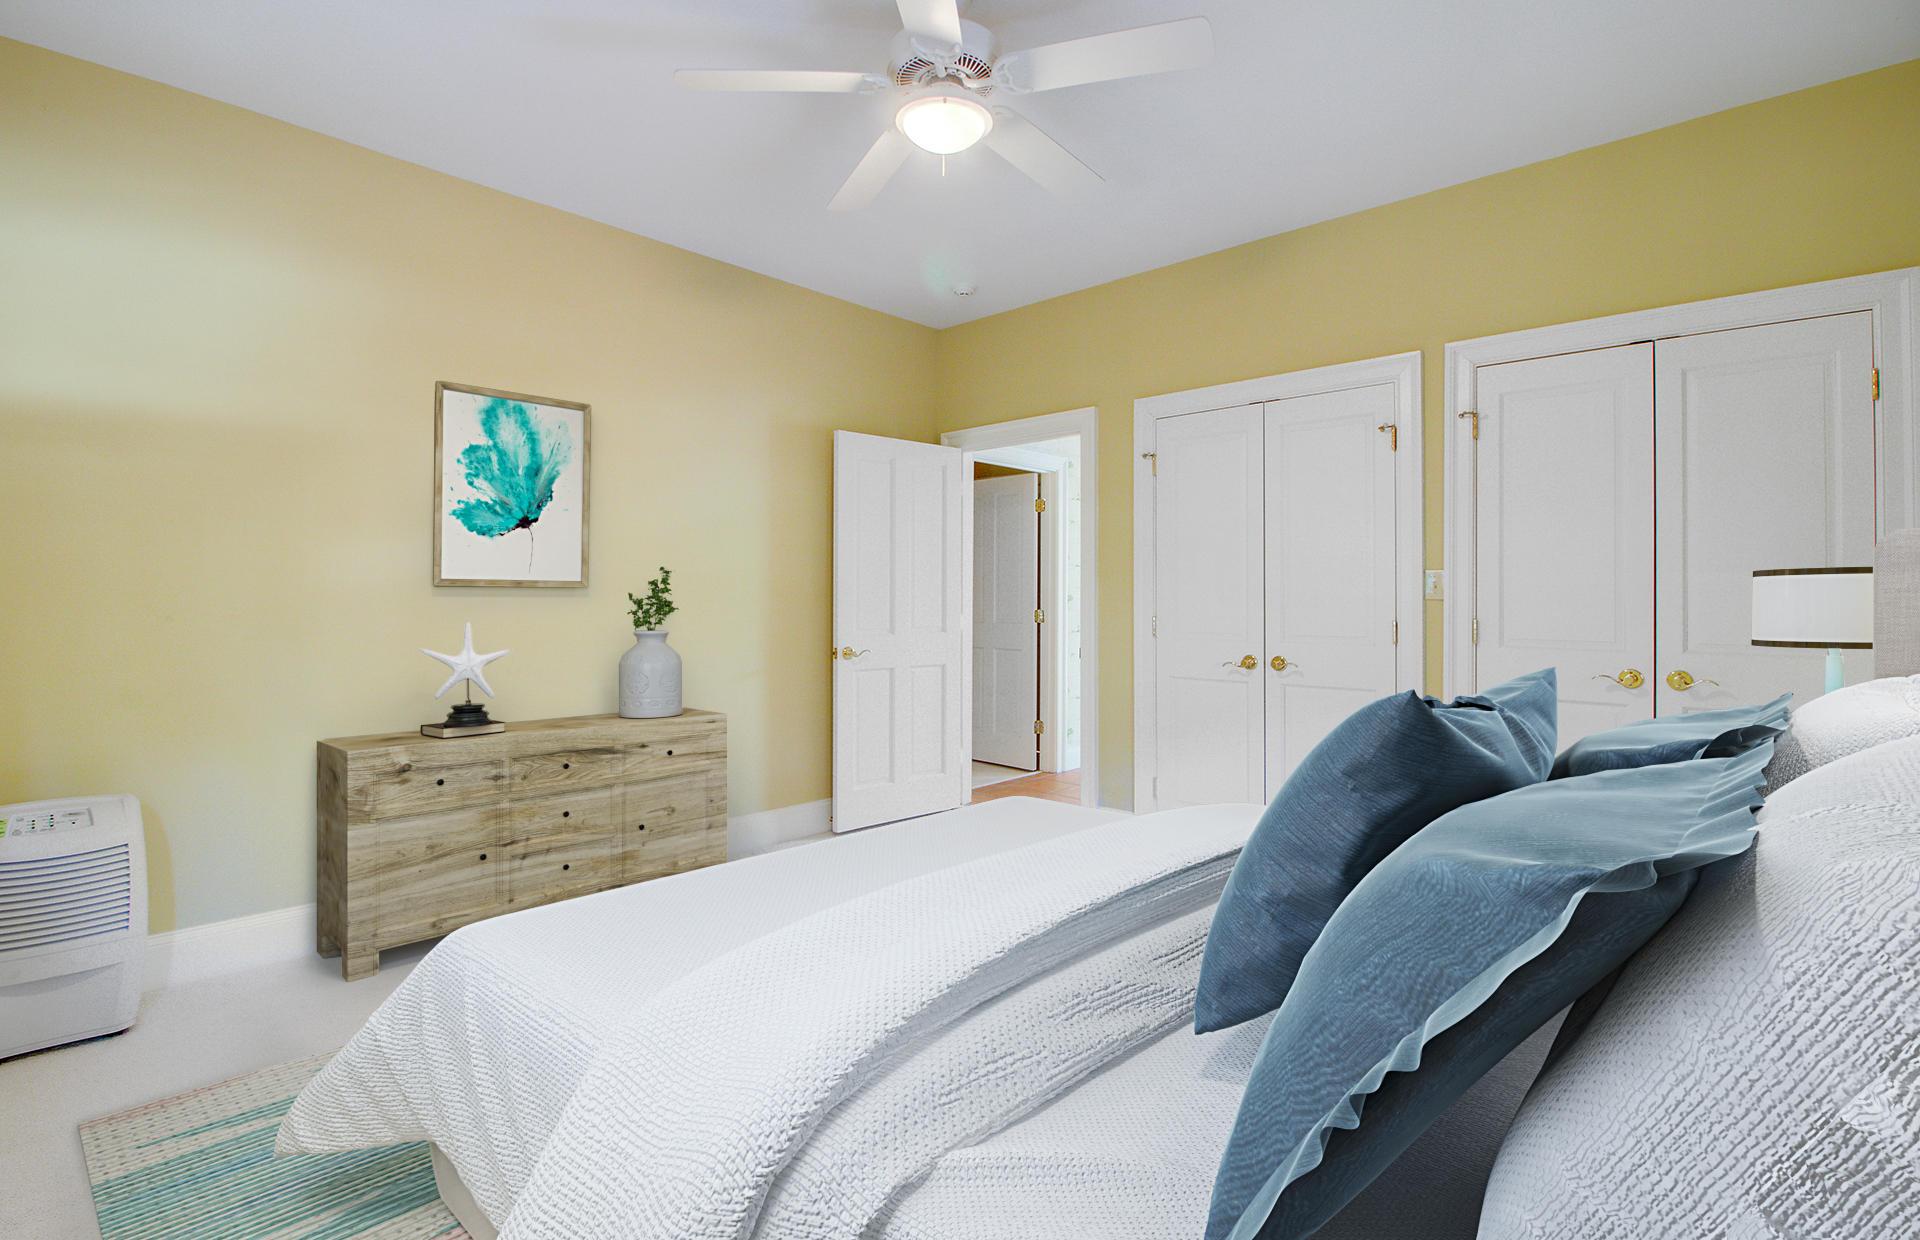 Kiawah Island Homes For Sale - 402 Ocean Oaks, Kiawah Island, SC - 21